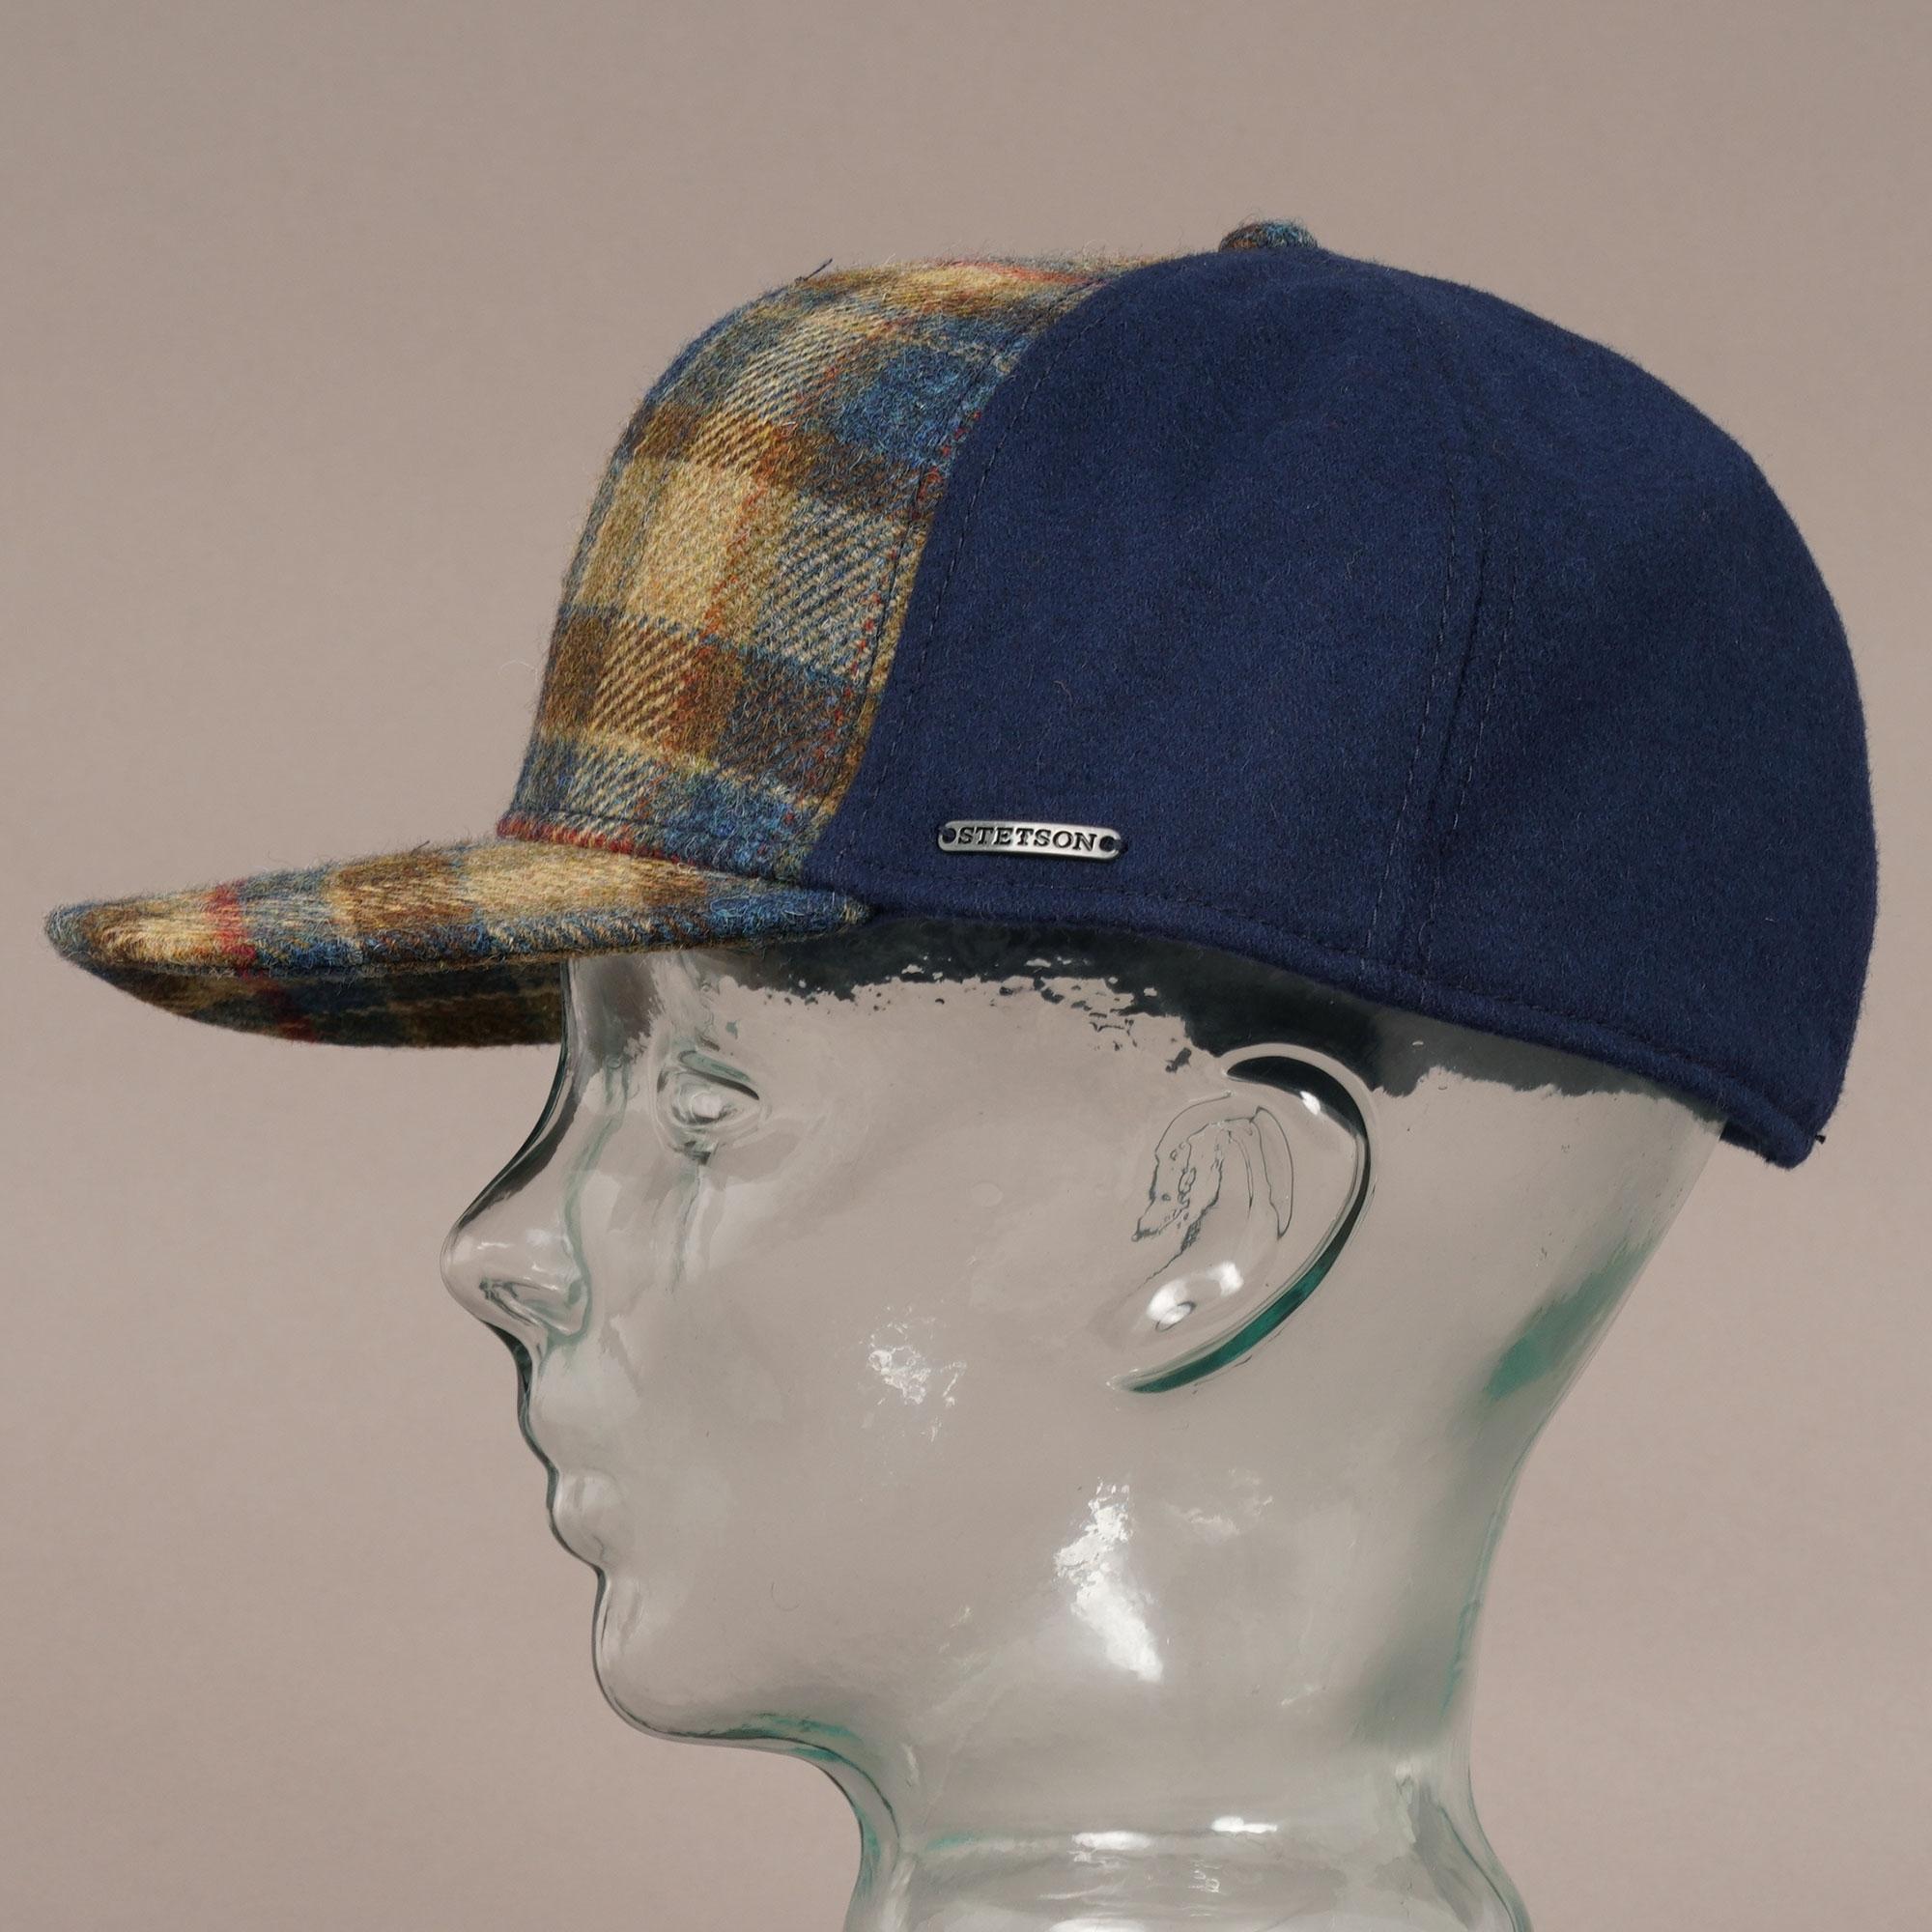 Virgin Wool Trucker Cap - Blue Check 41d86f73acc